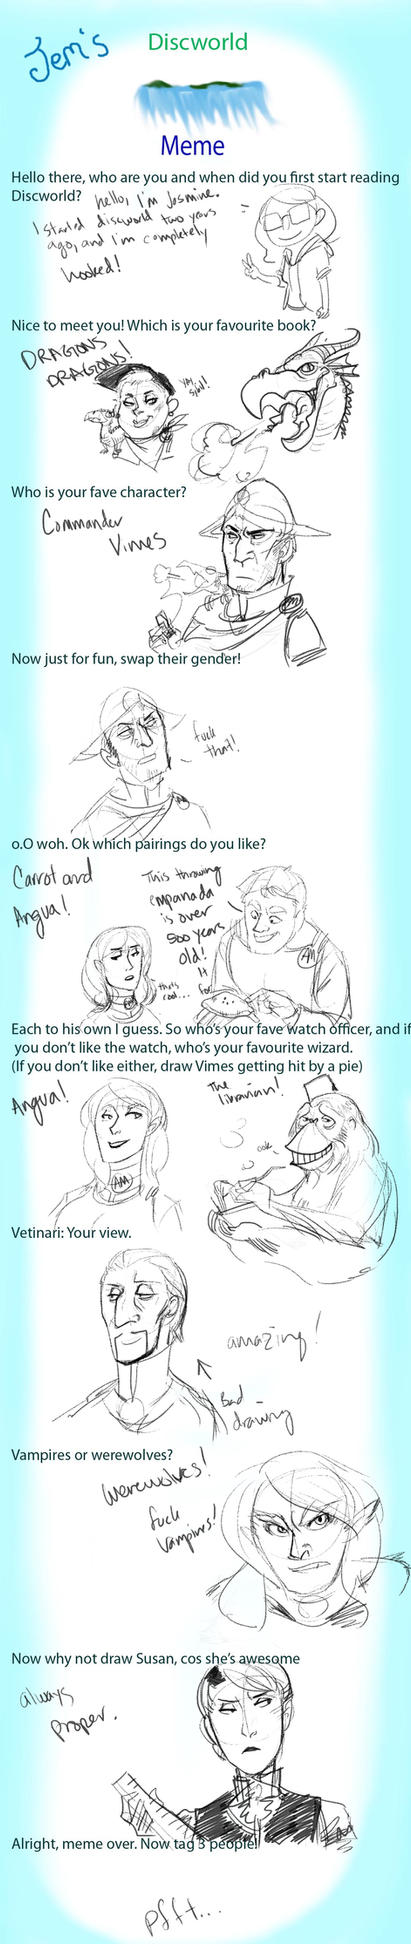 Discworld Meme by JasmineLea